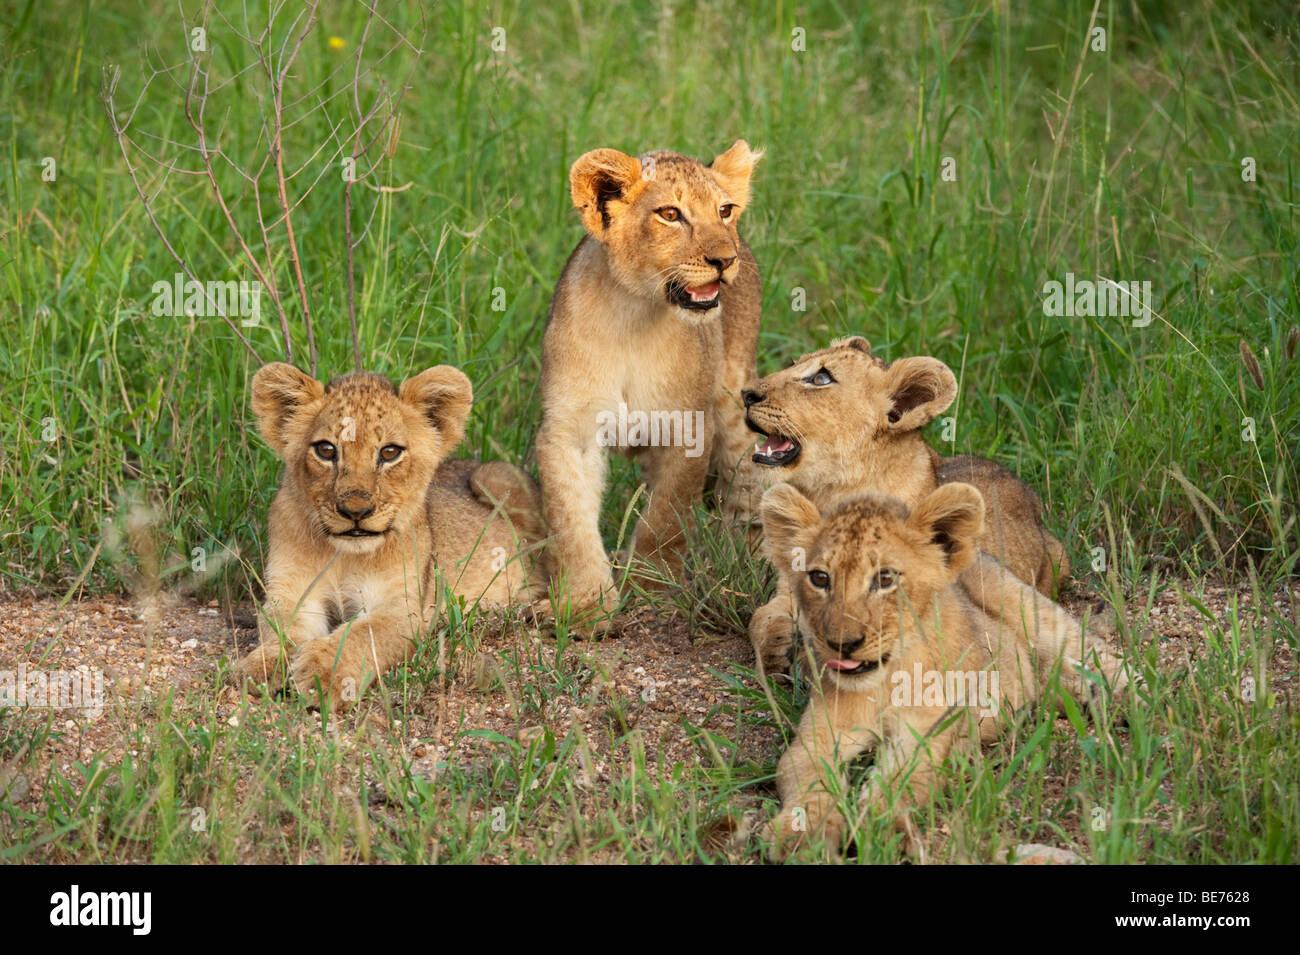 Lion cubs (Panthero leo), Kruger National Park, South Africa Stock Photo